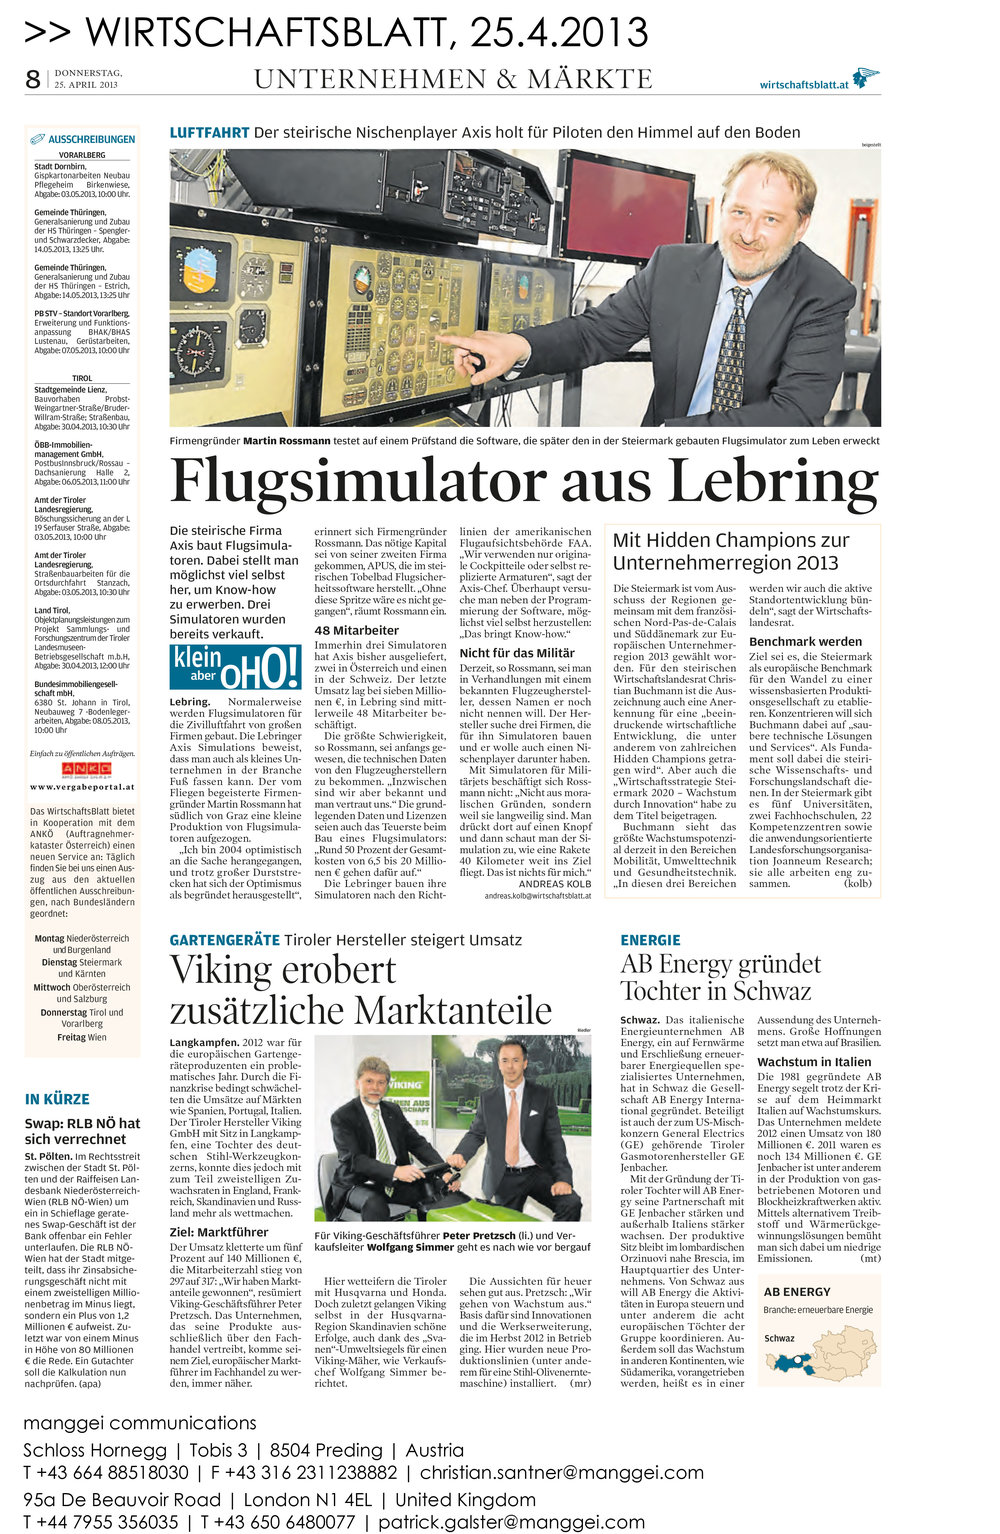 manggei-communications---presse-clippings-komplett---journalistenreise-2013_-8.jpg